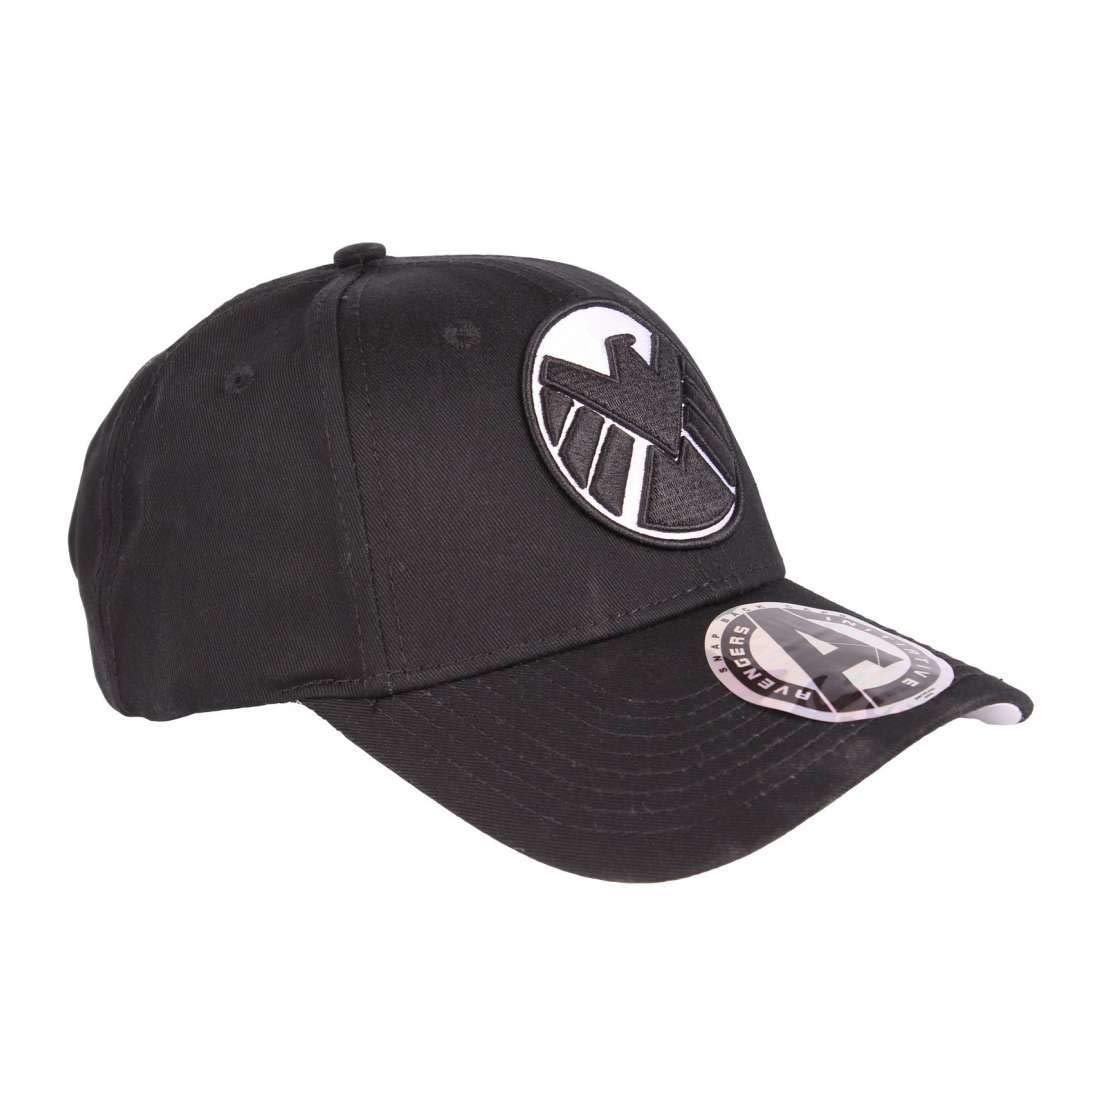 CAP SHIELD MARVEL - BASEBALL LOGO Cotton Division 2962